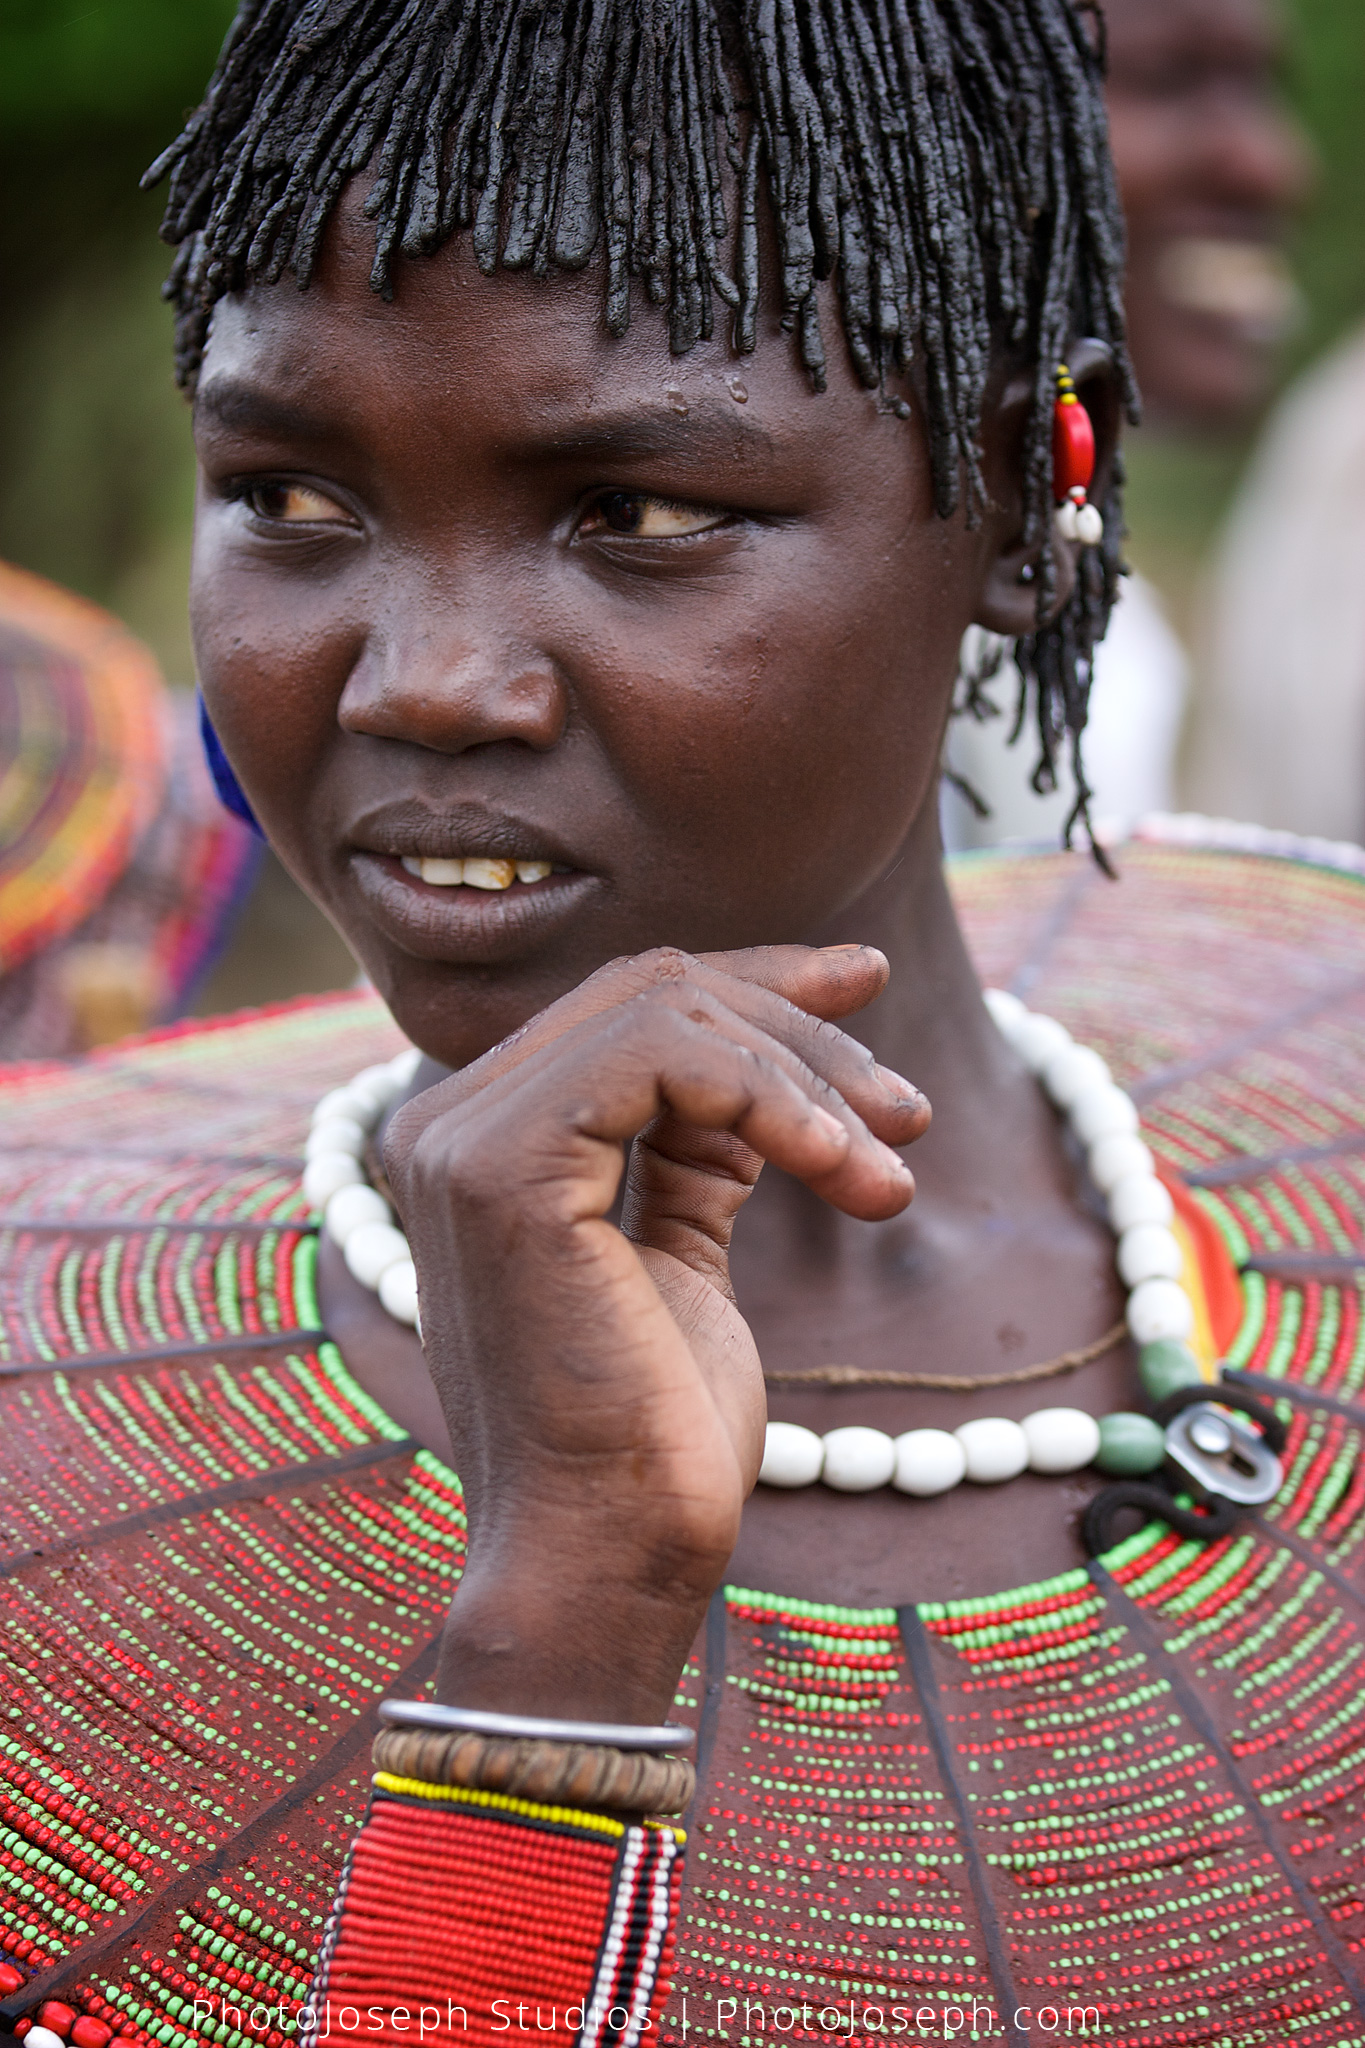 Beads of the Pokot